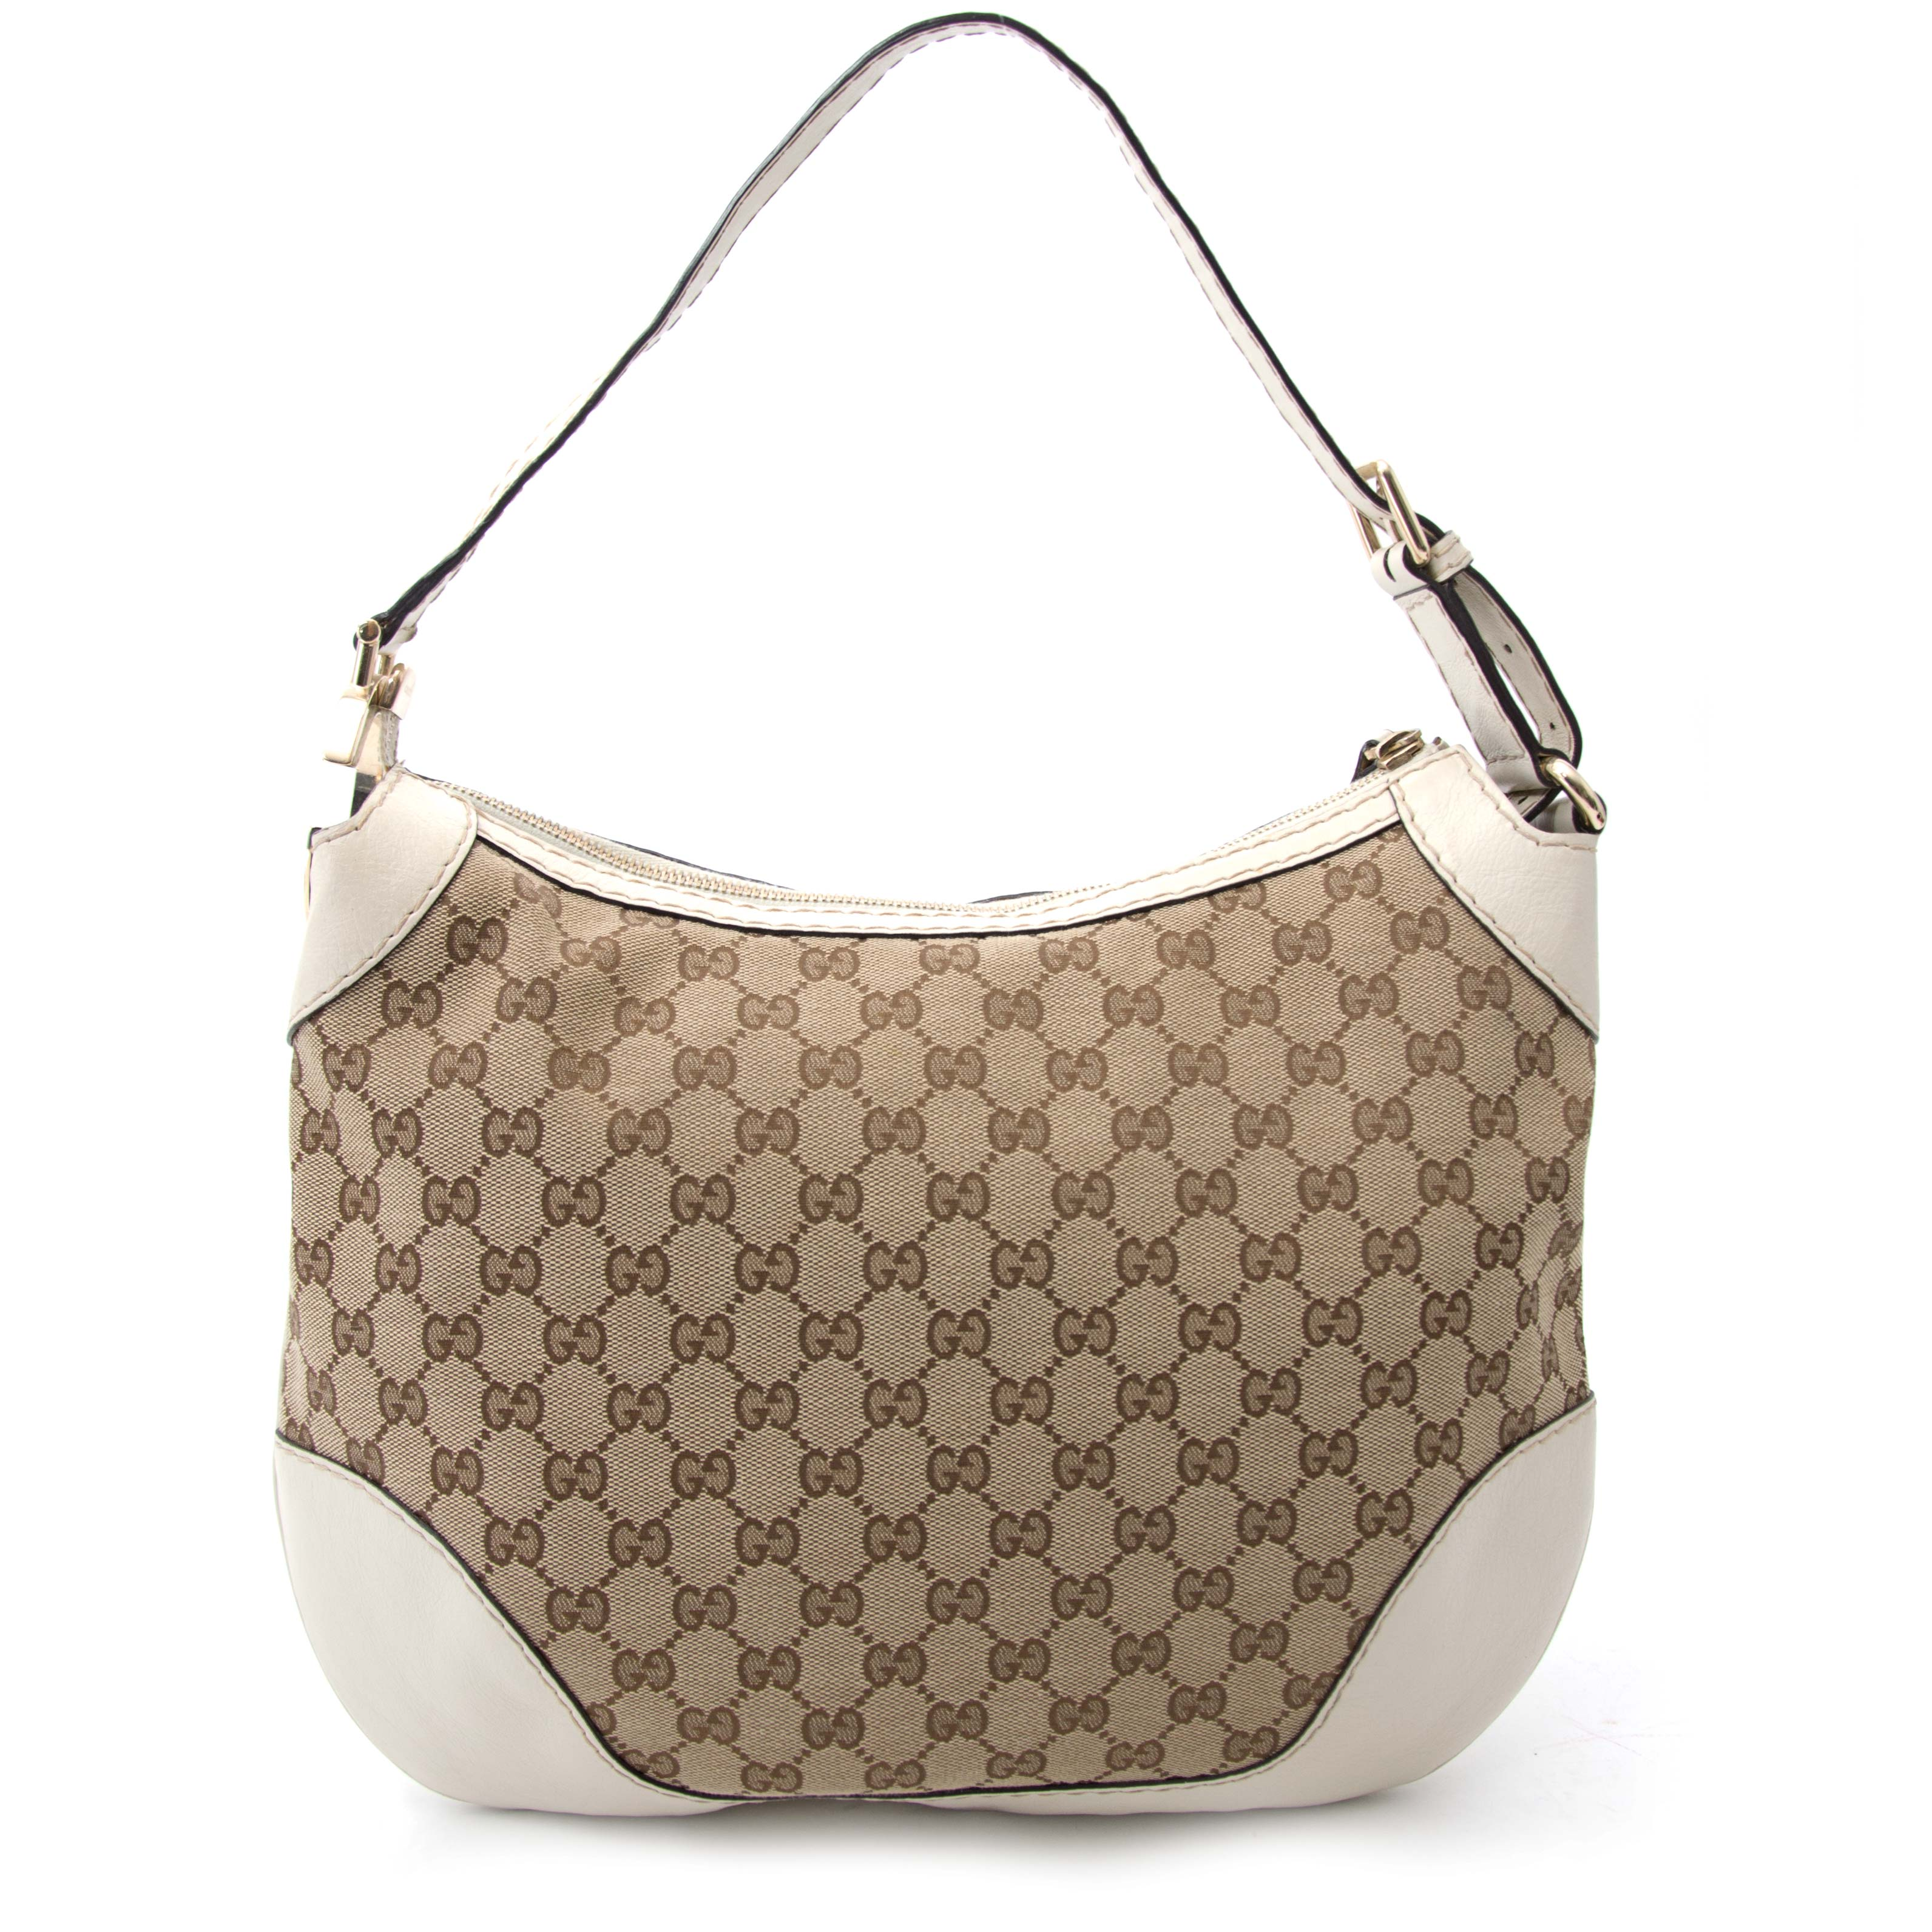 16e4ffa46fa0 Labellov Buy luxury designer vintage online ○ Buy and Sell ...